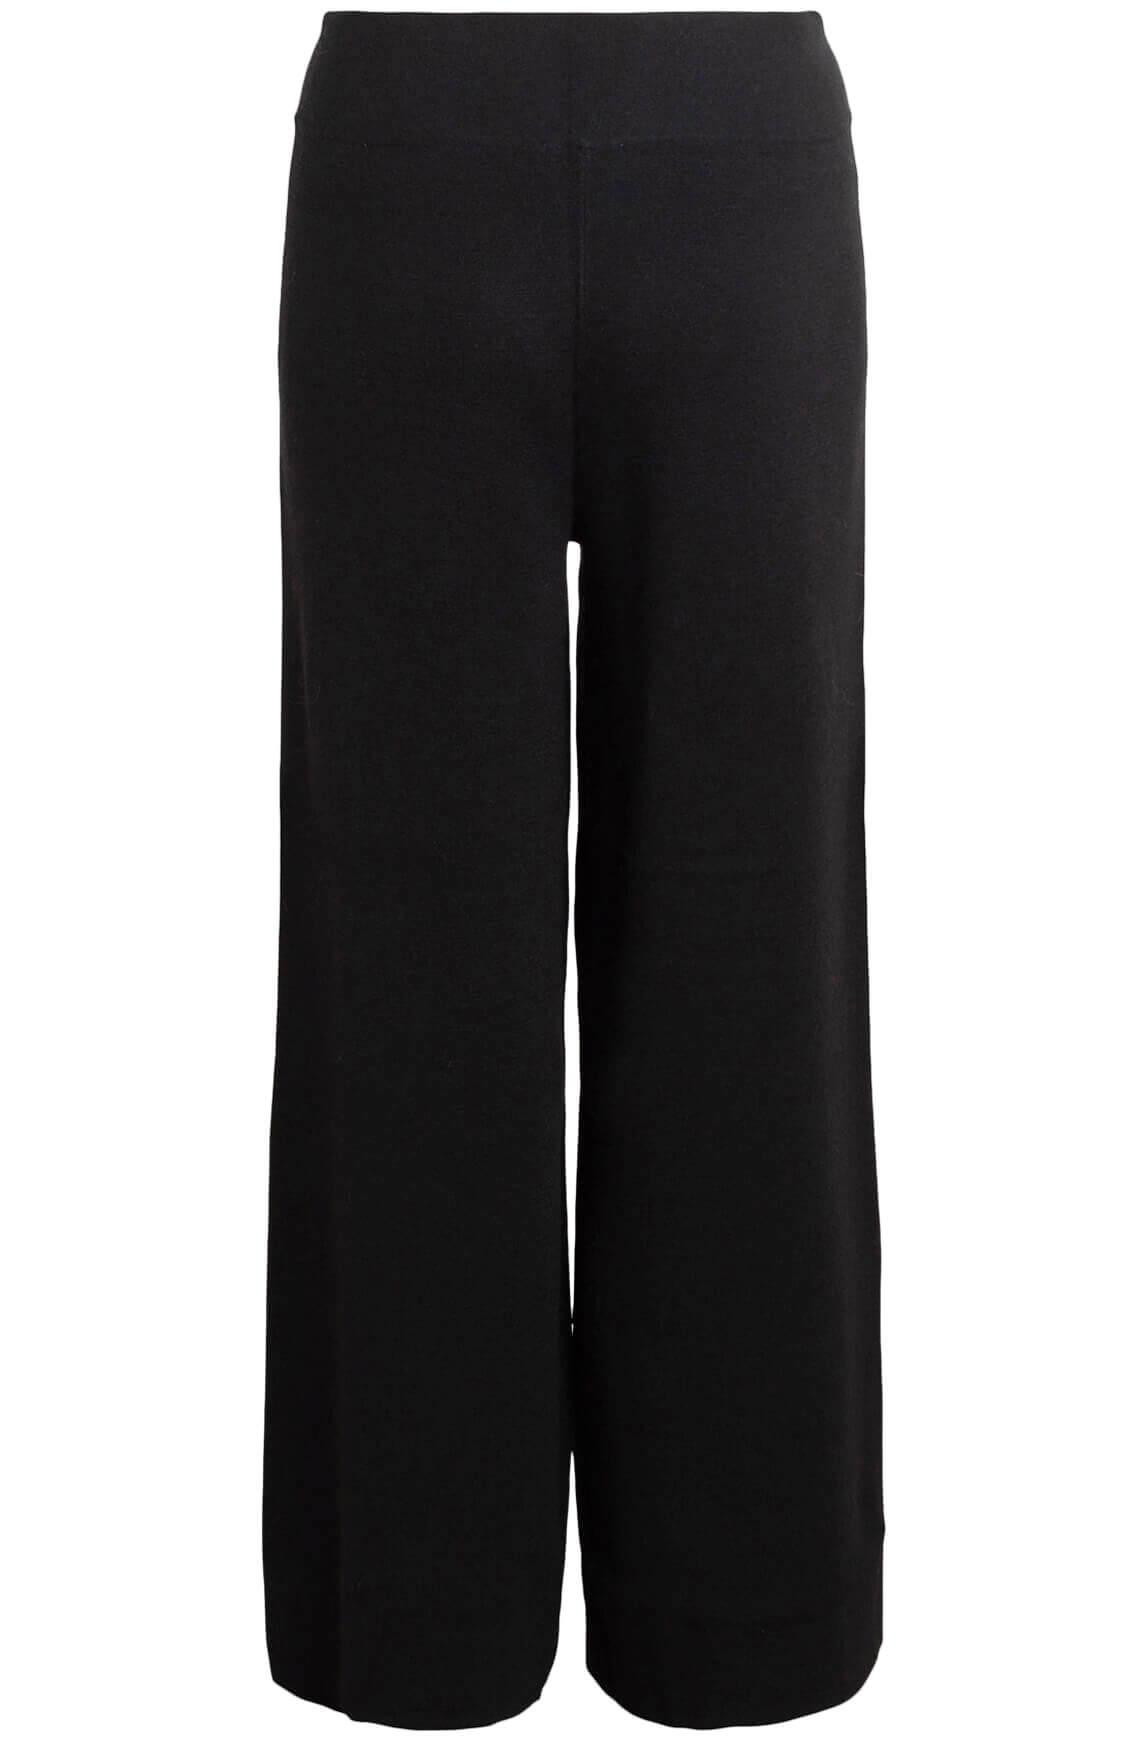 Anna Dames Wijde broek zwart